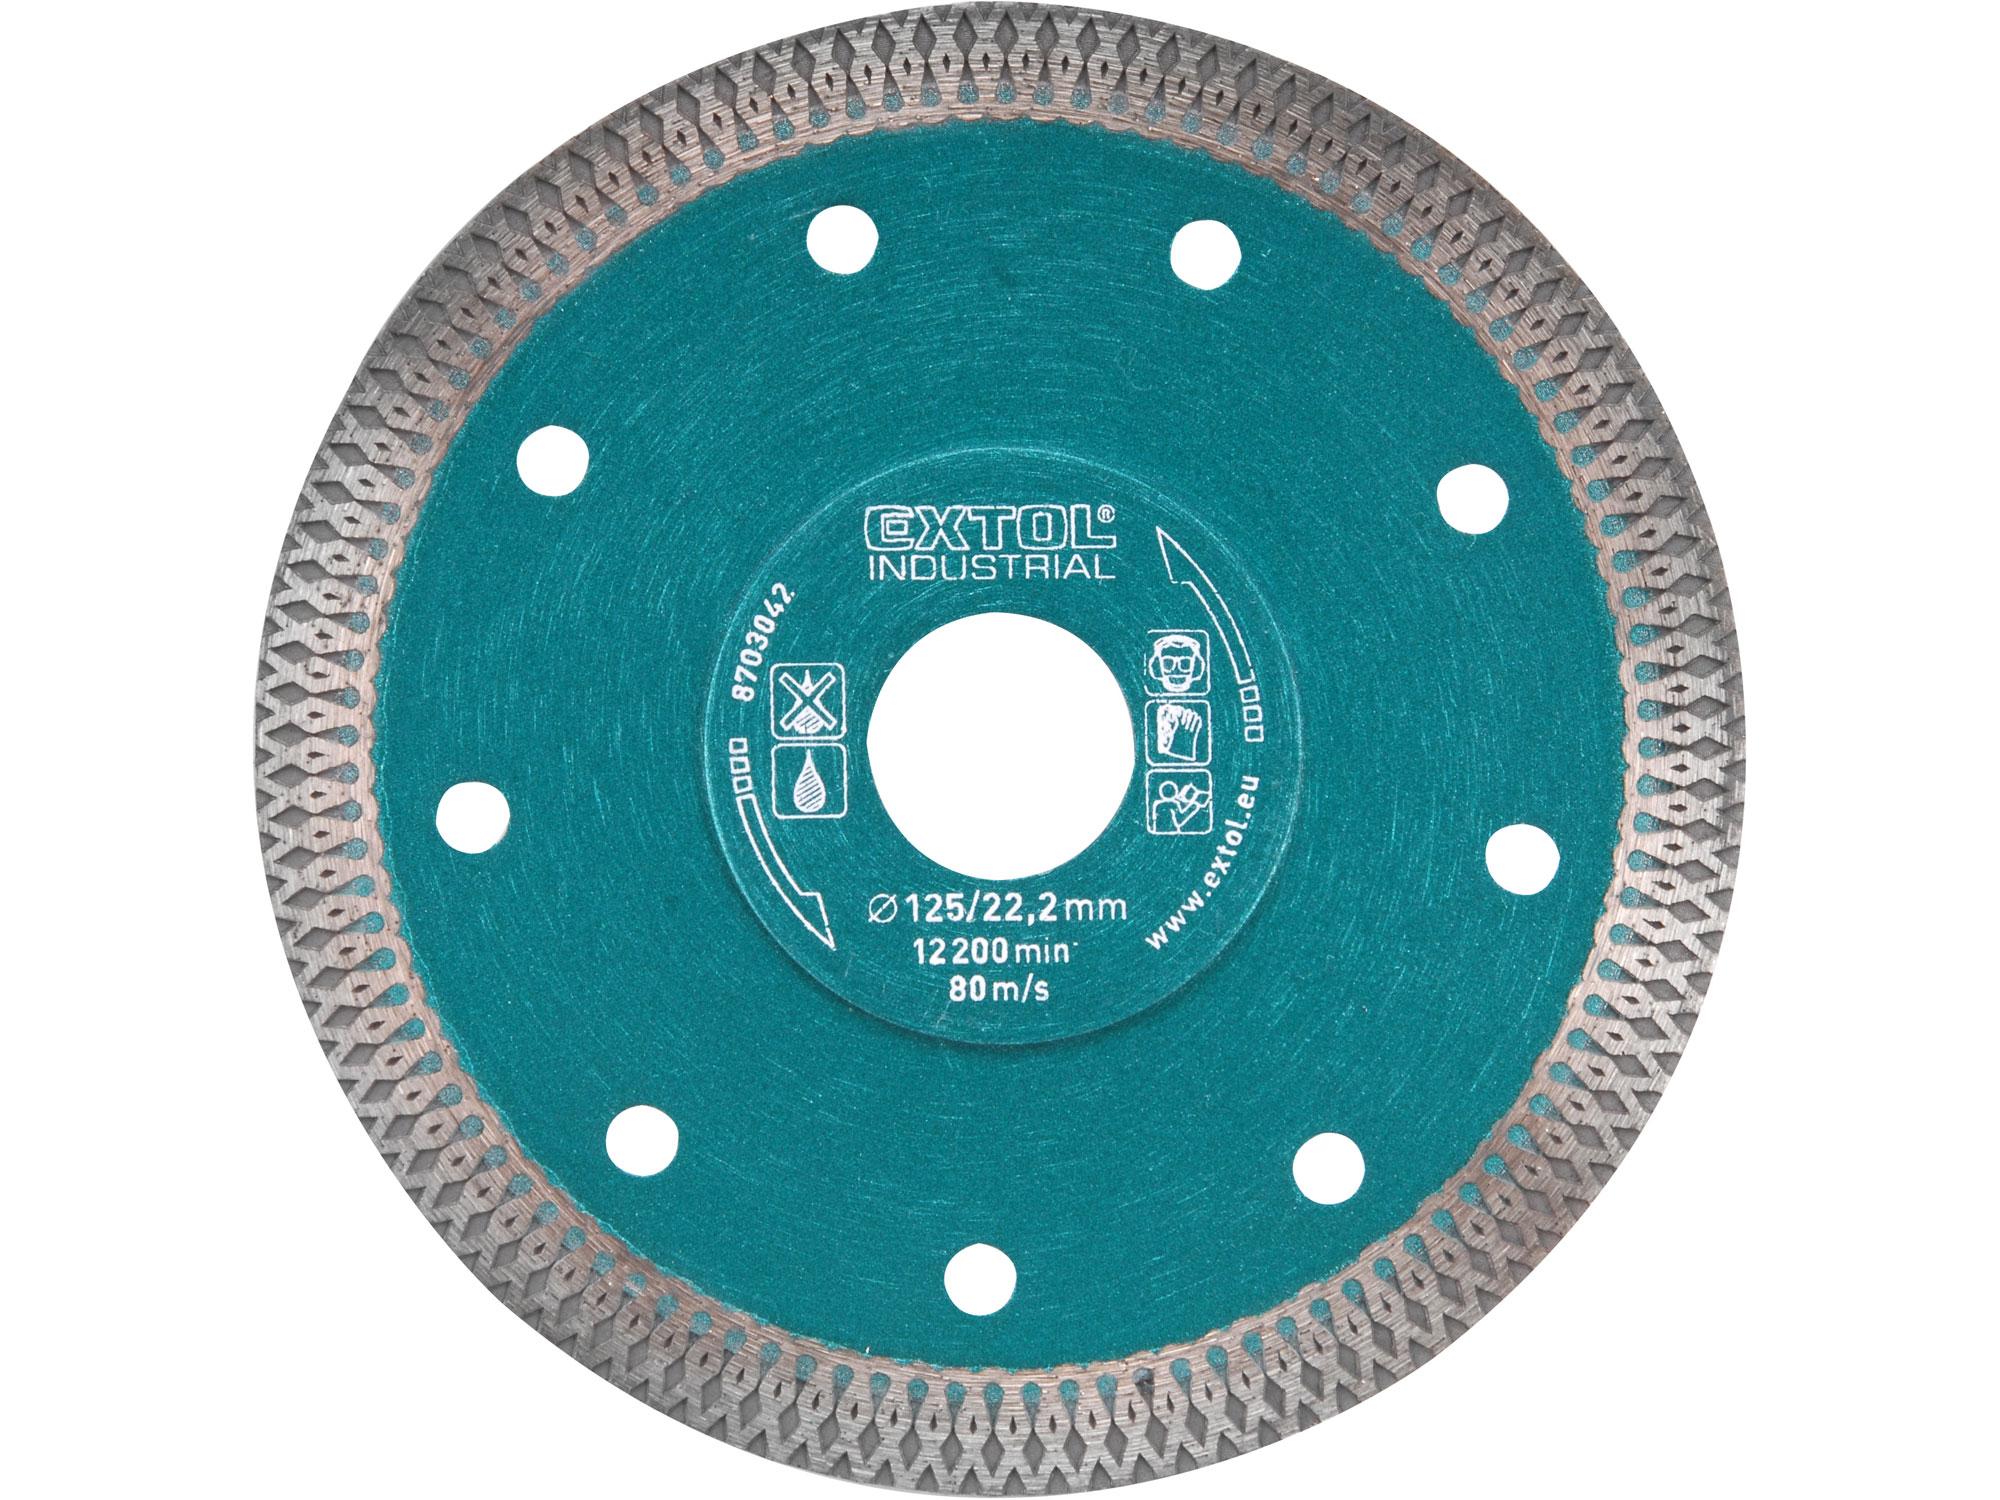 125mm Diamond Cutting Disc, Thin Wet & Dry Cut, 125mm Dia, 22.2mm ID x 1.5mm thk